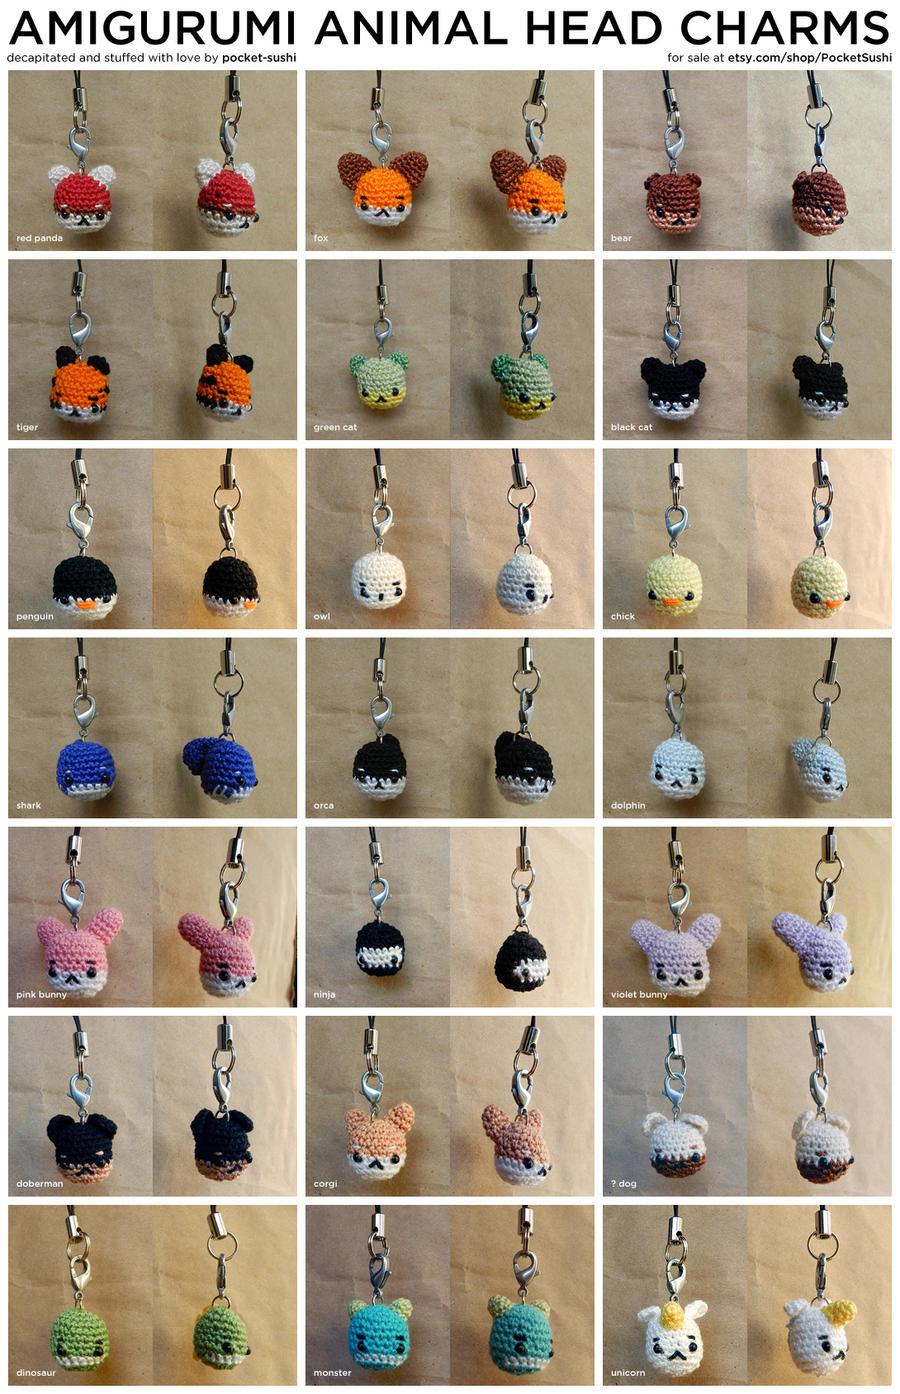 Amigurumi Animal Head Charms by pocket-sushi on DeviantArt